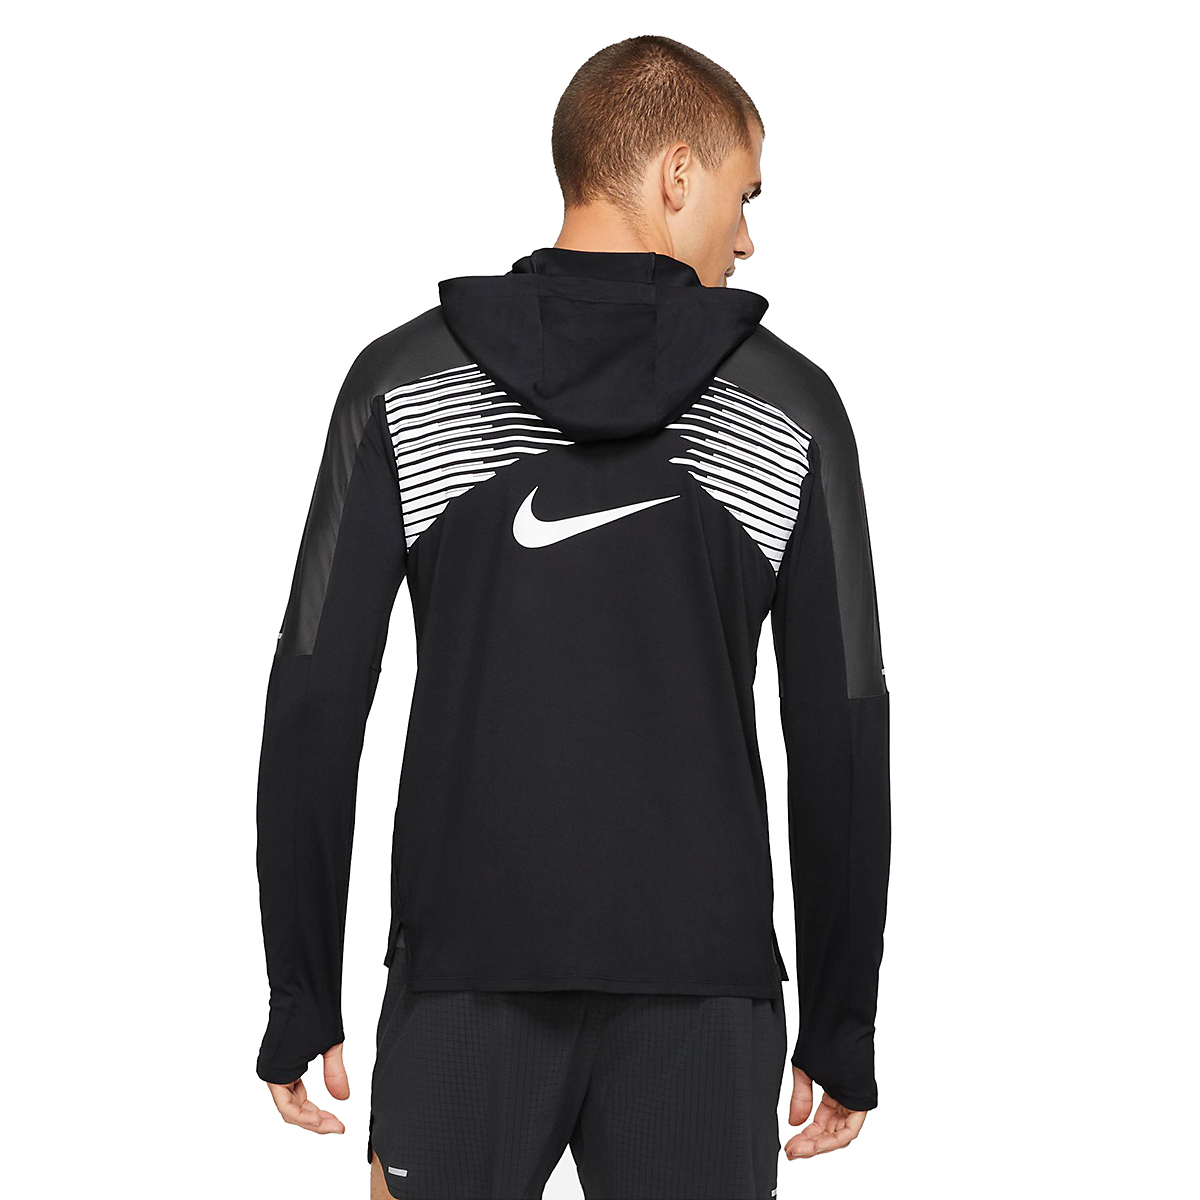 Men's Nike Dri-FIT Element 1/2-Zip Trail Running Top - Color: Black/Black/Dark Smoke Grey/White - Size: XS, Black/Black/Dark Smoke Grey/White, large, image 2